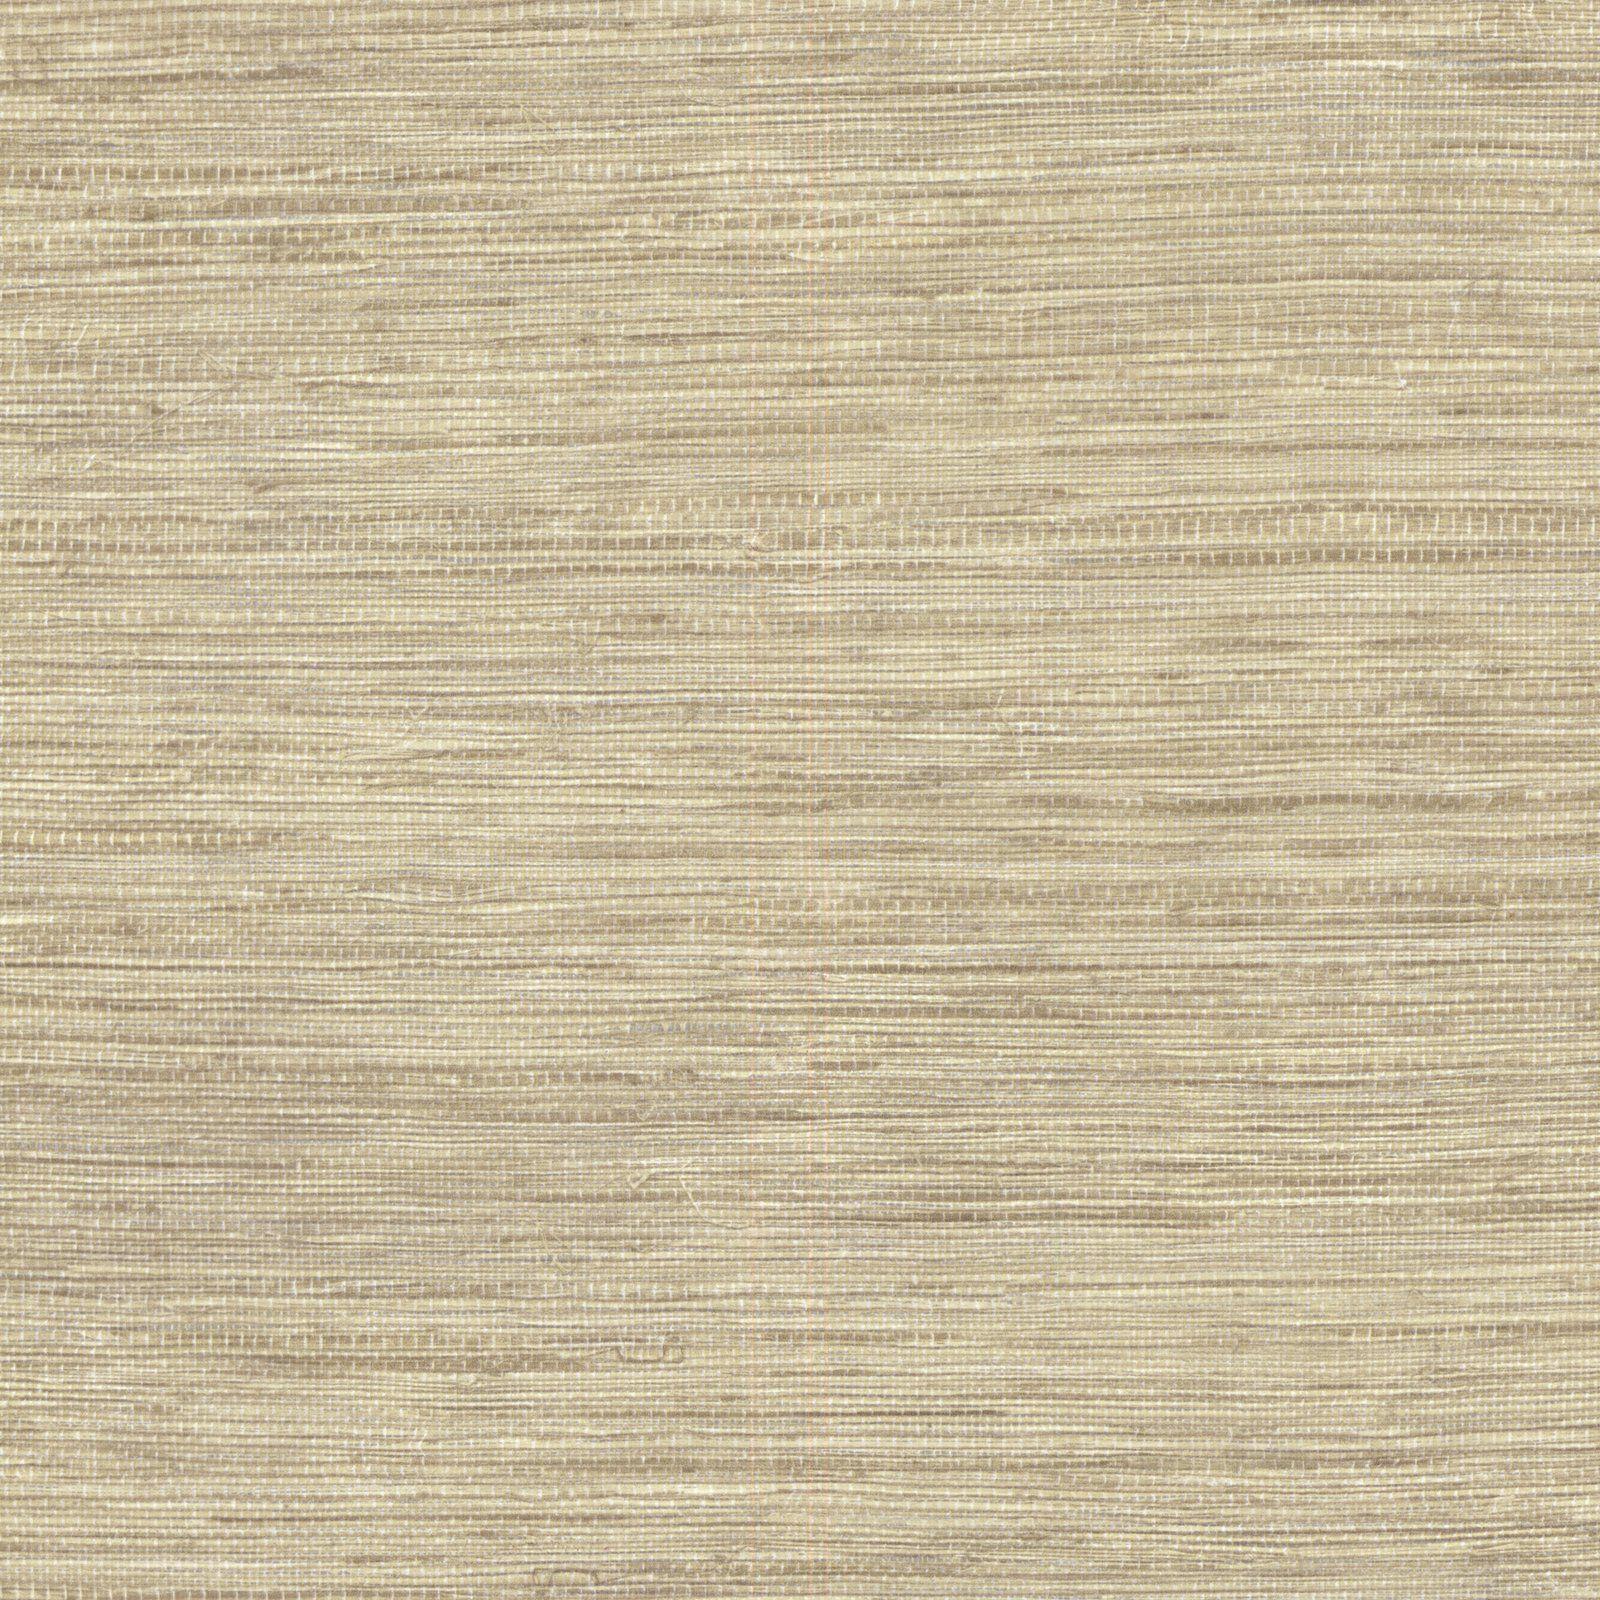 Brewster Tapis Faux Grasscloth Wallpaper 420 87085 Beige